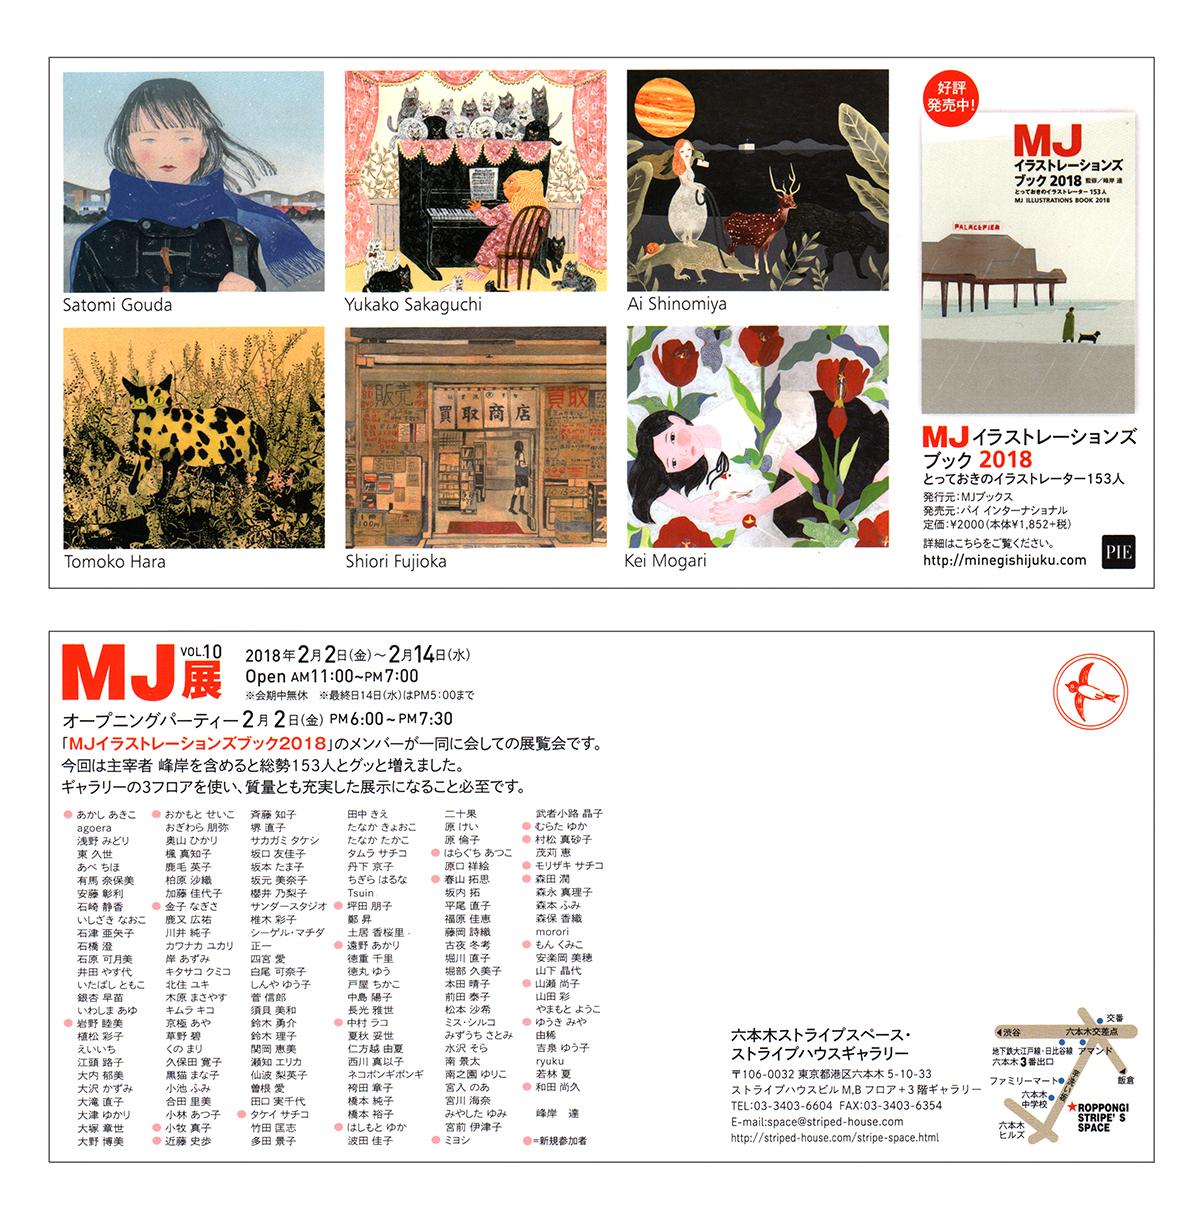 MJ展 vol.10 のお知らせ